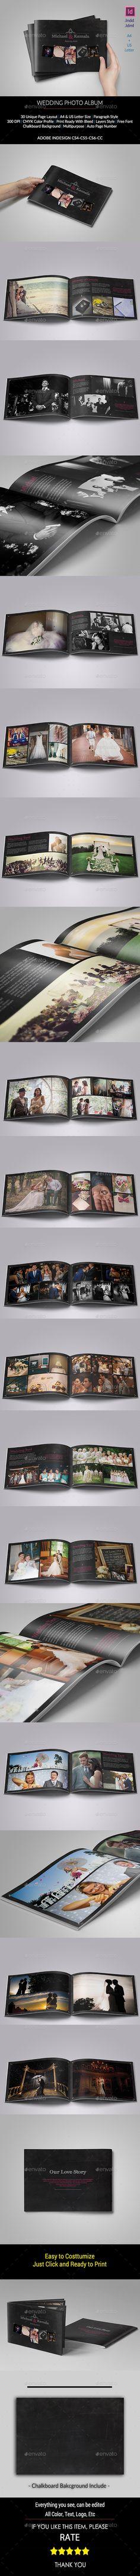 3d wedding album montage free download